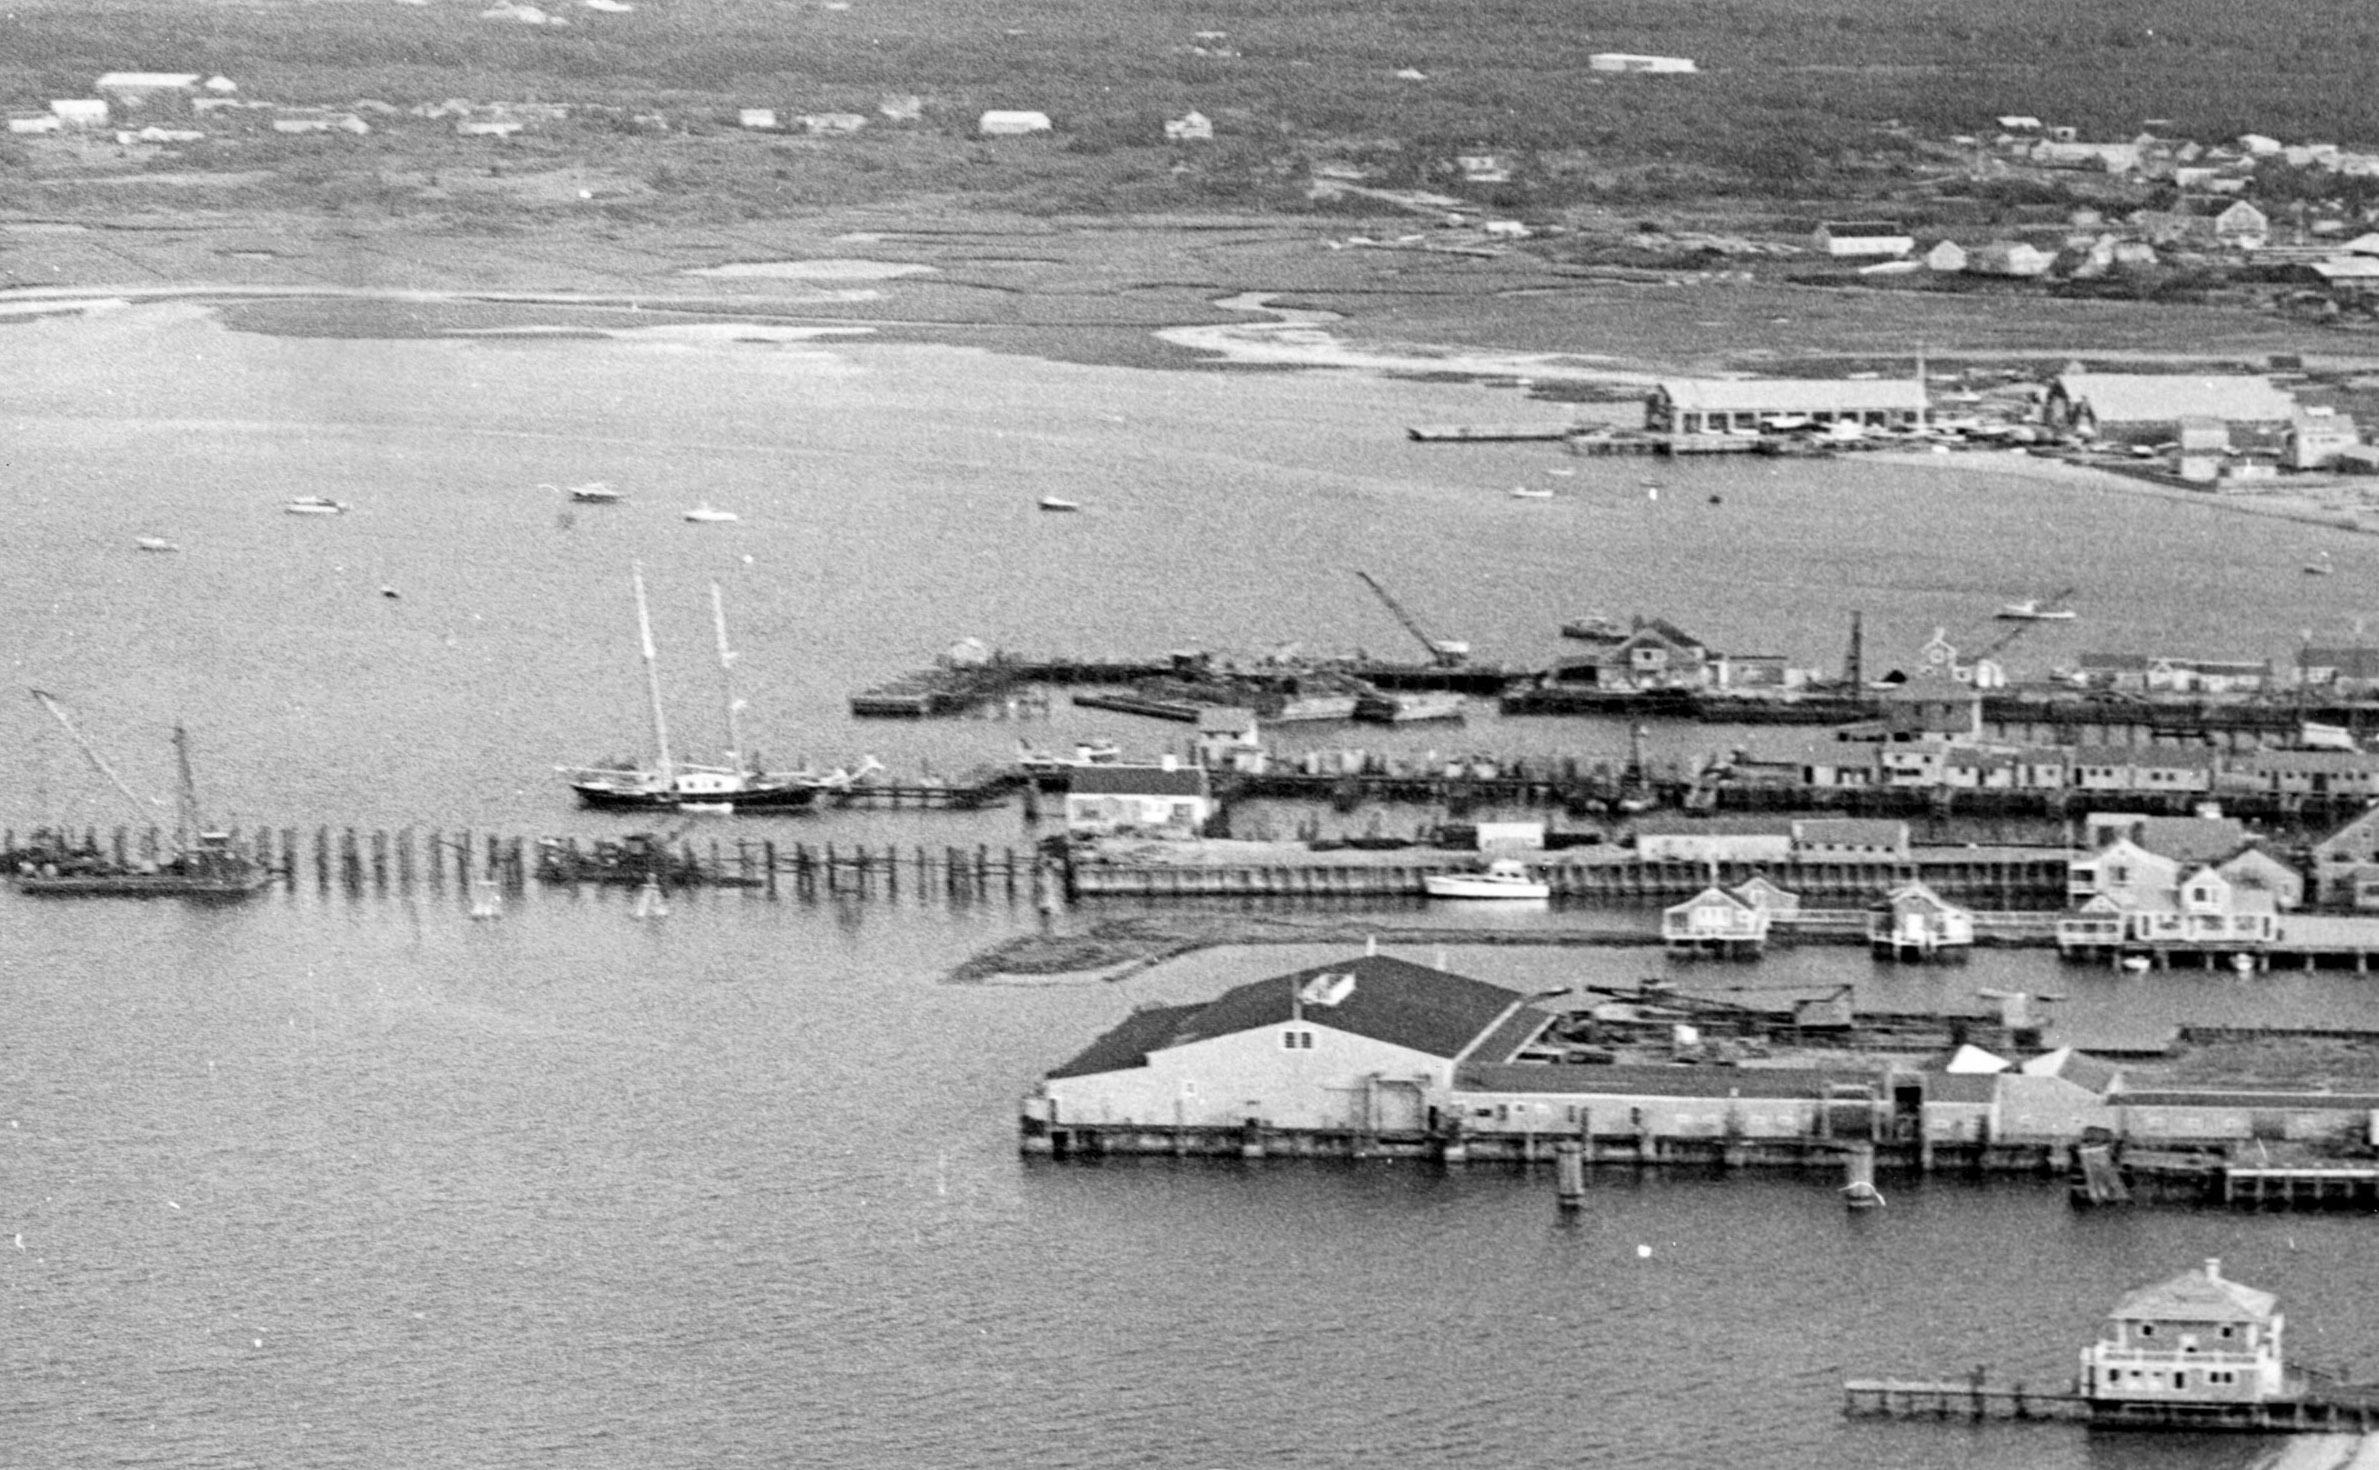 Nantucket Boat Basin 50